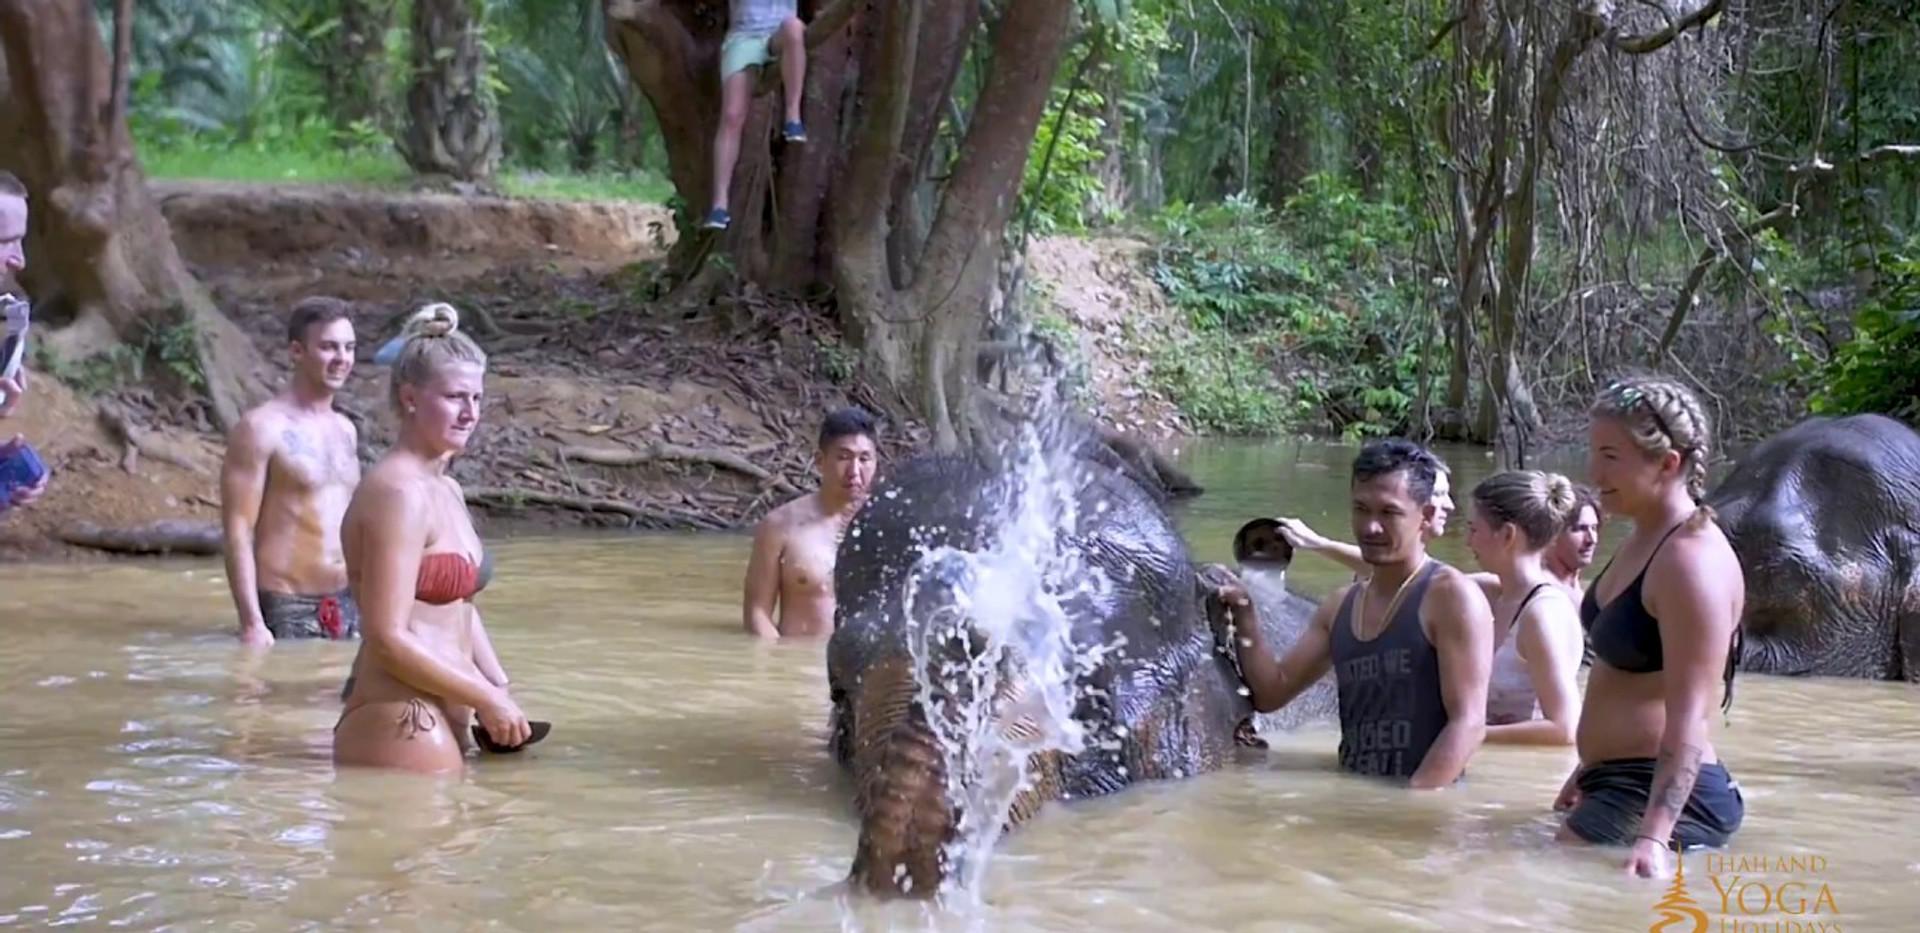 Thailand Yoga Holidays Destination Jungle Treehouse Video